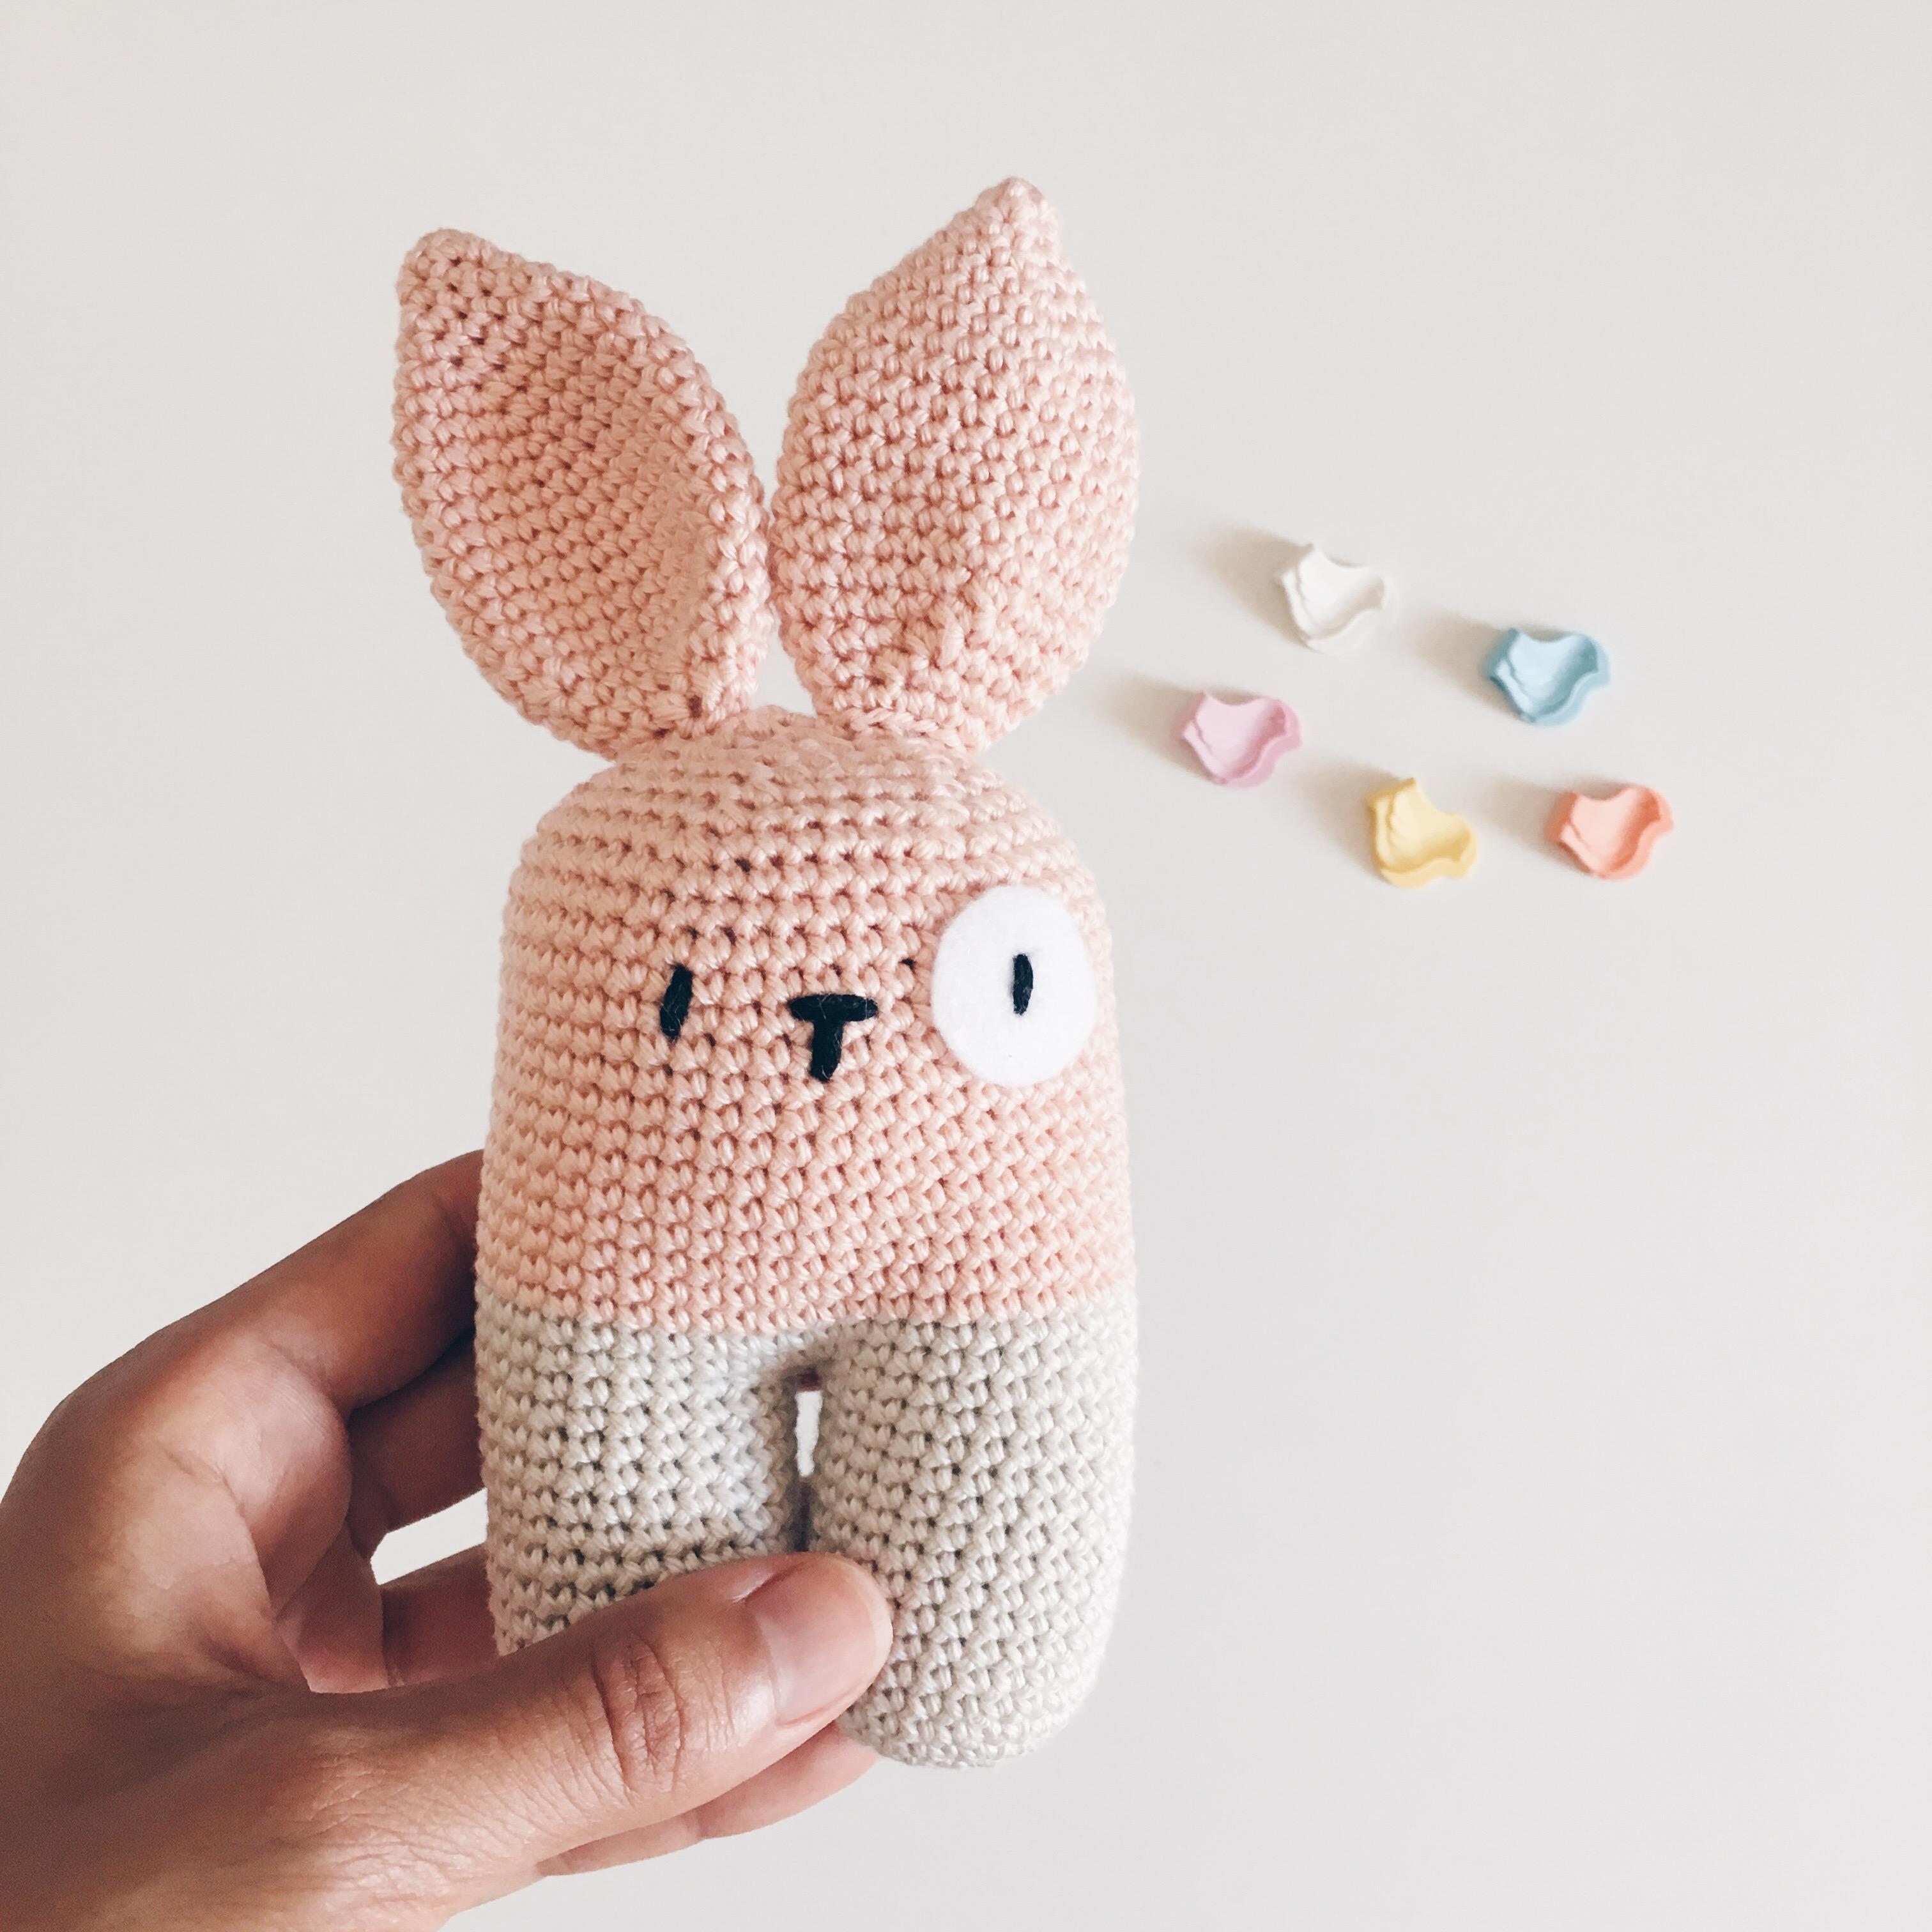 El conejito bípedo de Lanukas – Knitting is cool